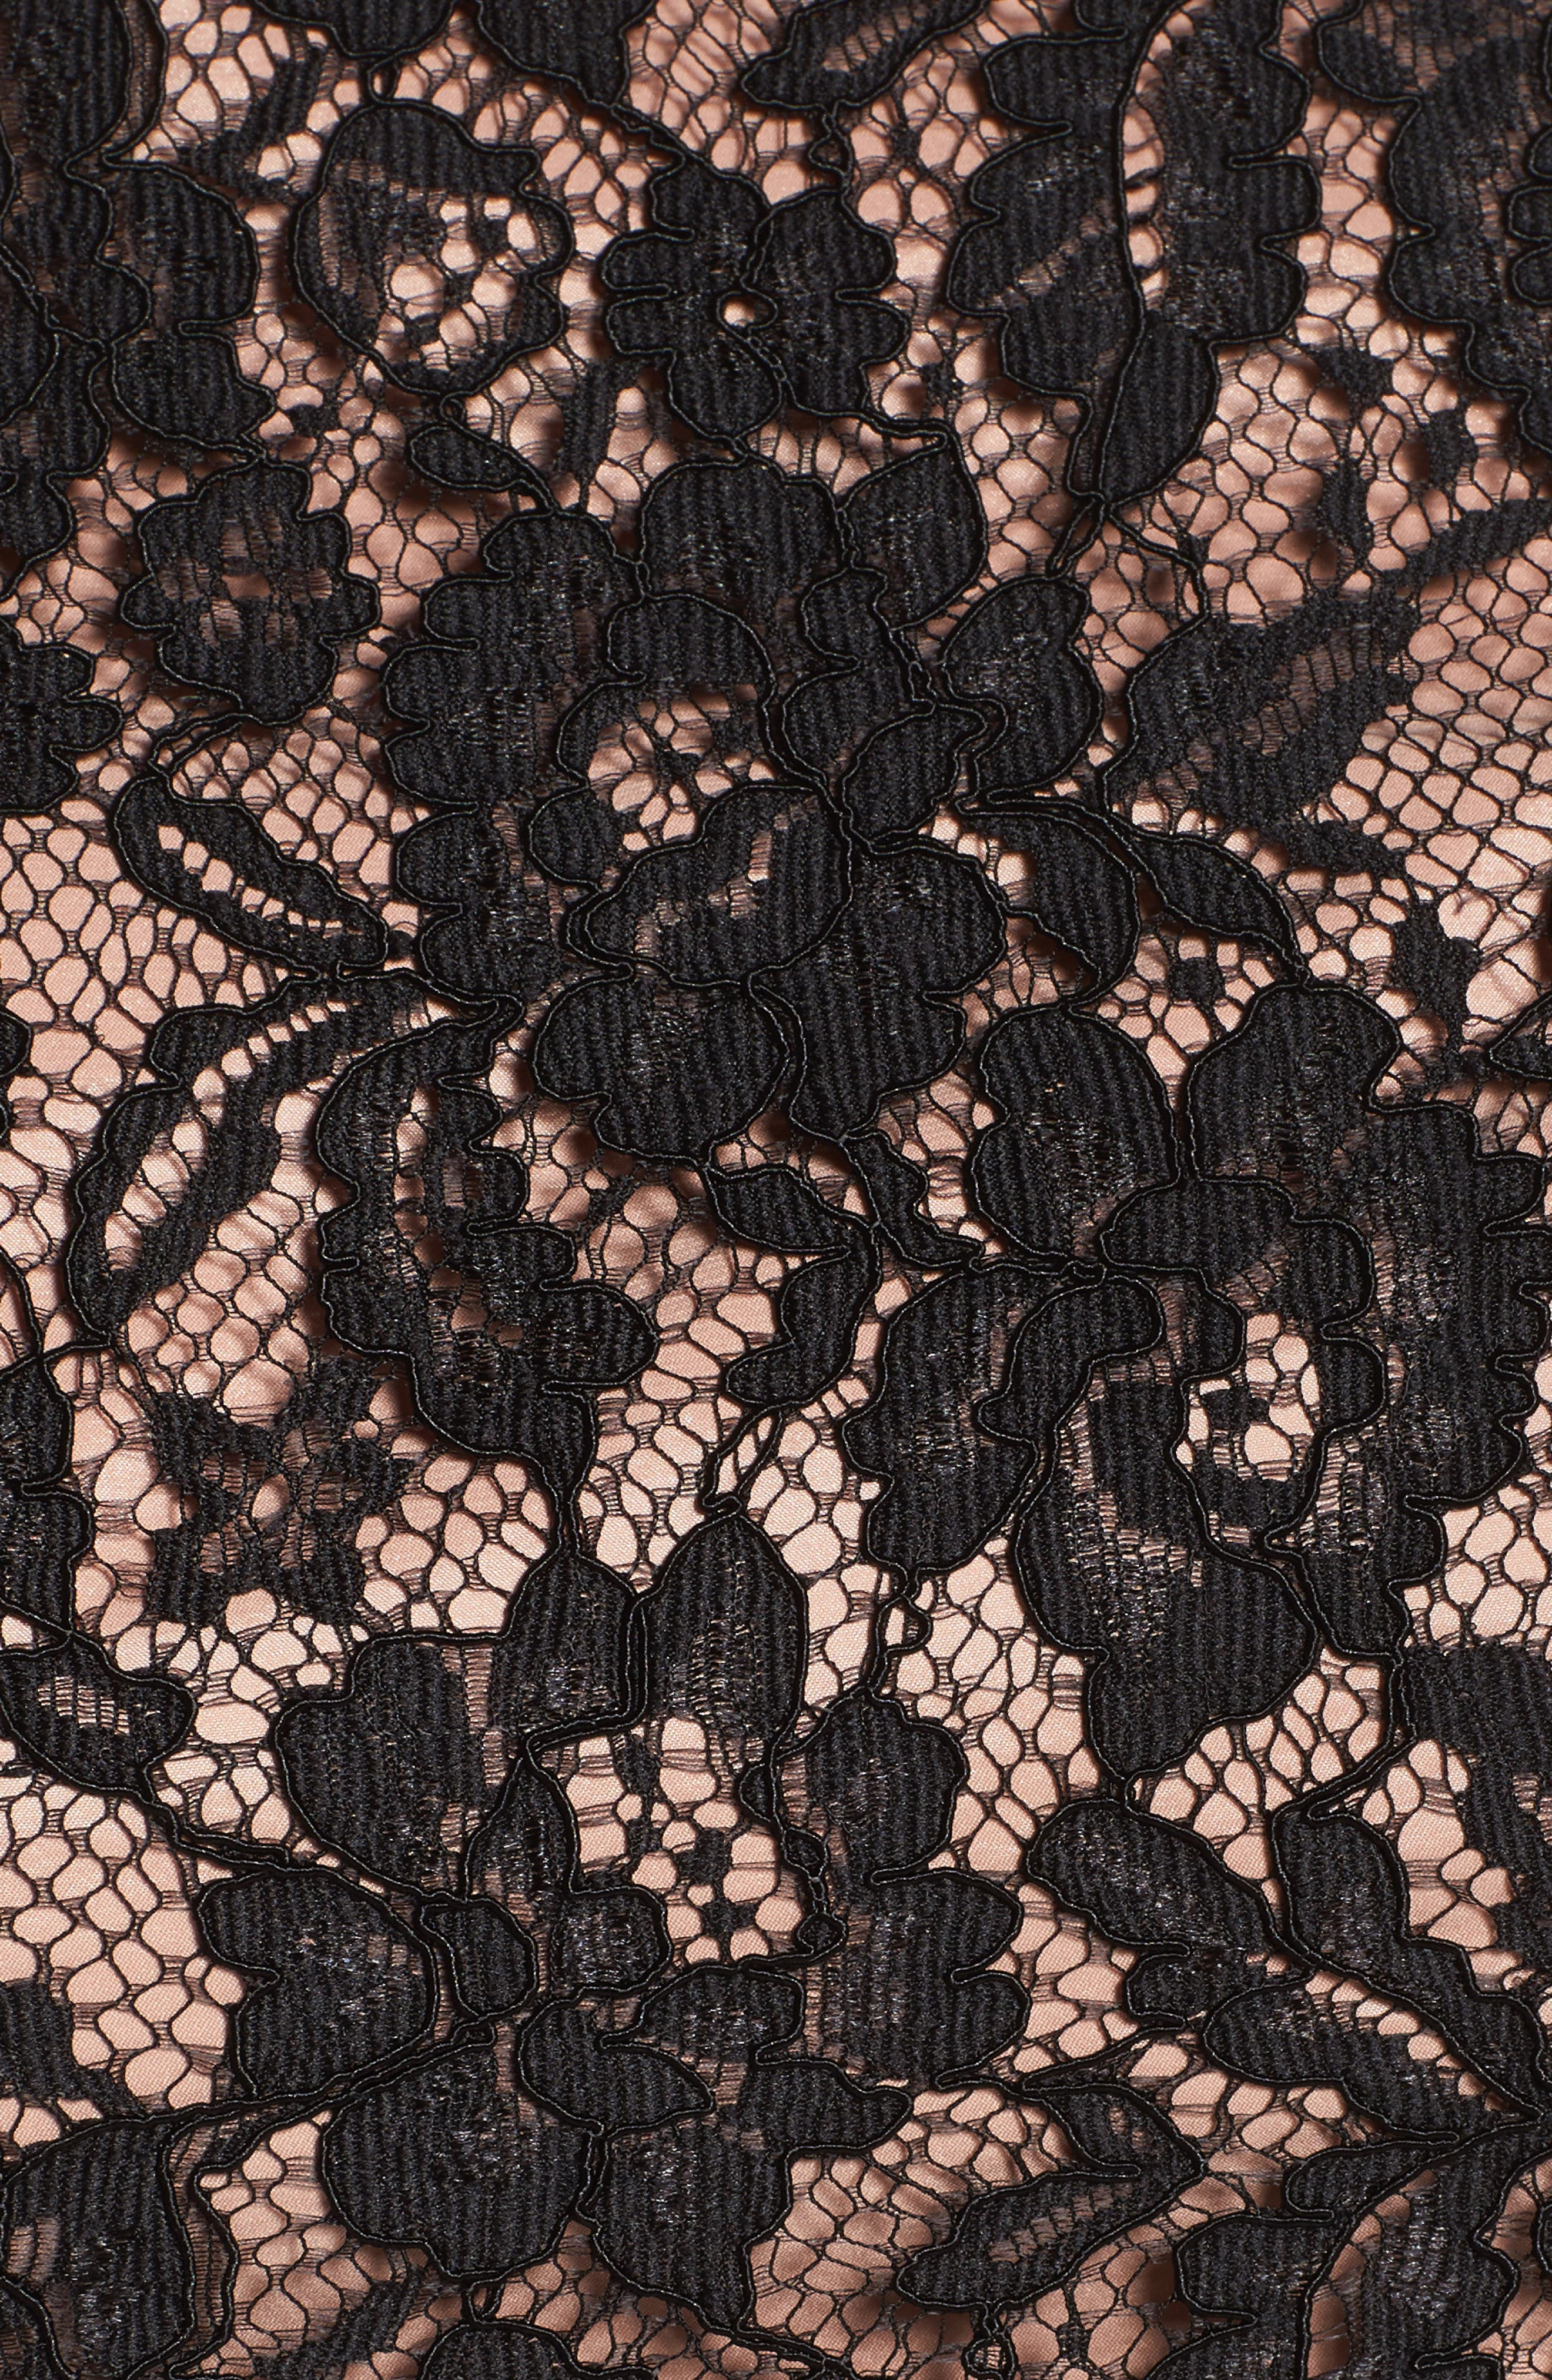 Decadent Lace Top,                             Alternate thumbnail 5, color,                             001